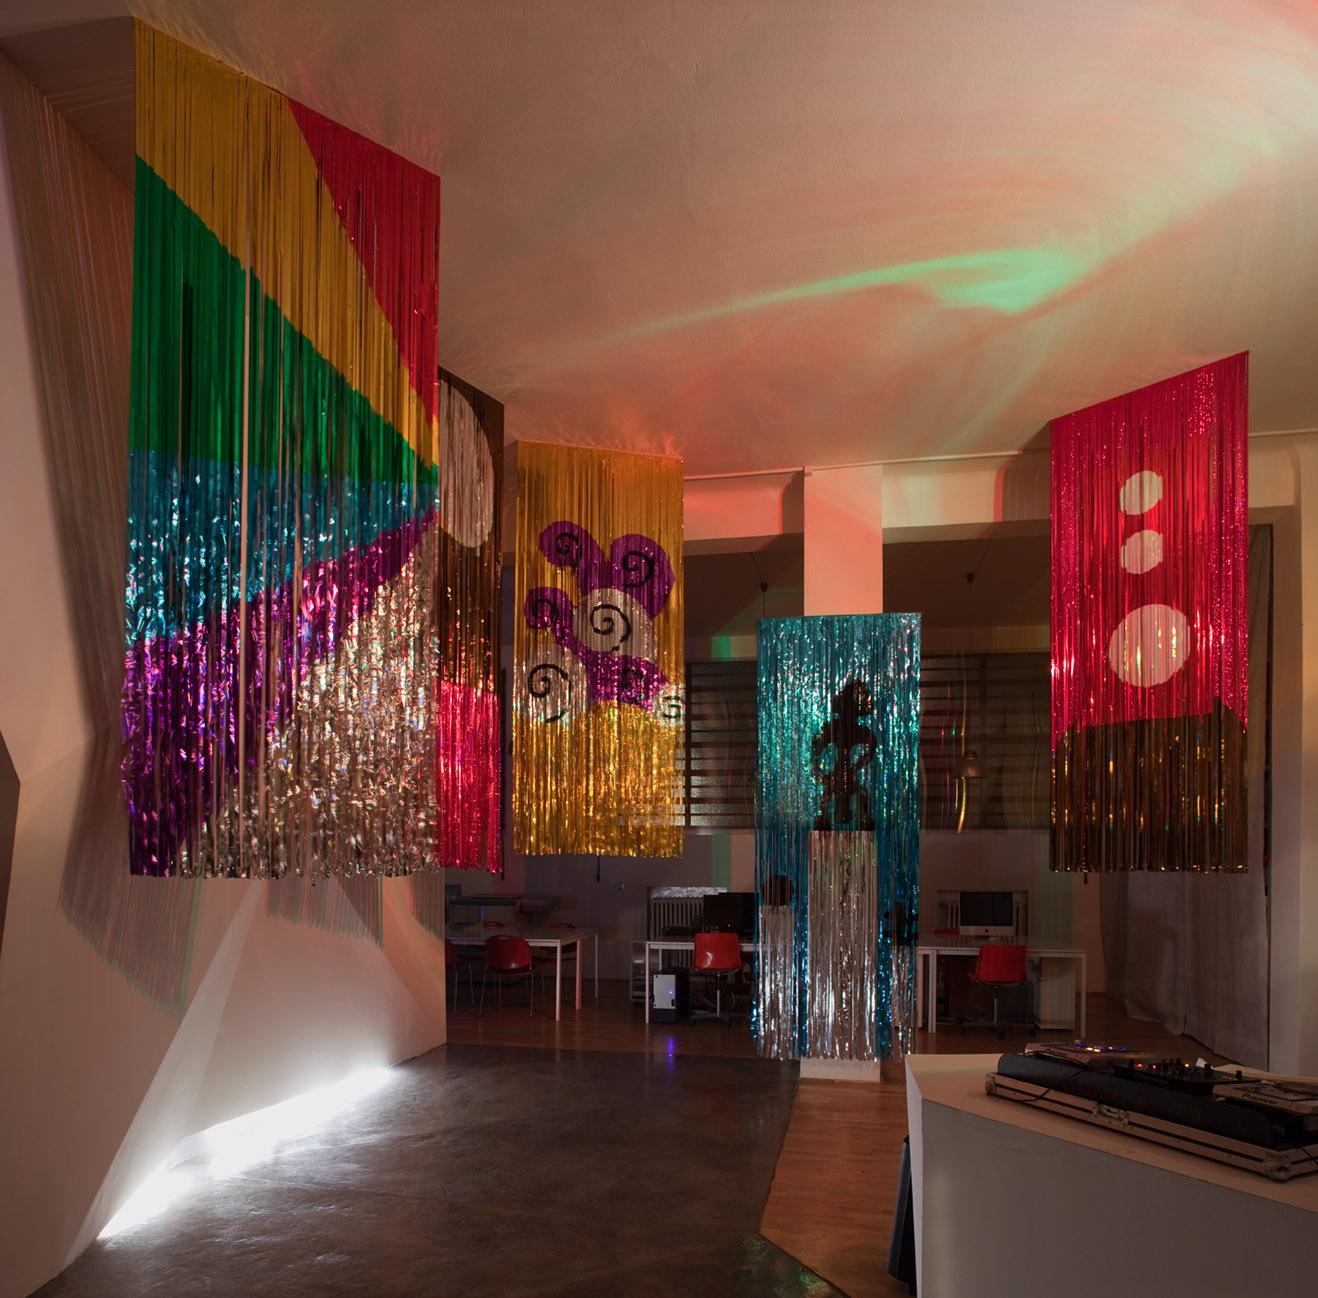 Daniel González, Disco Le Corbusier, installation view, Rizoma, Bologn